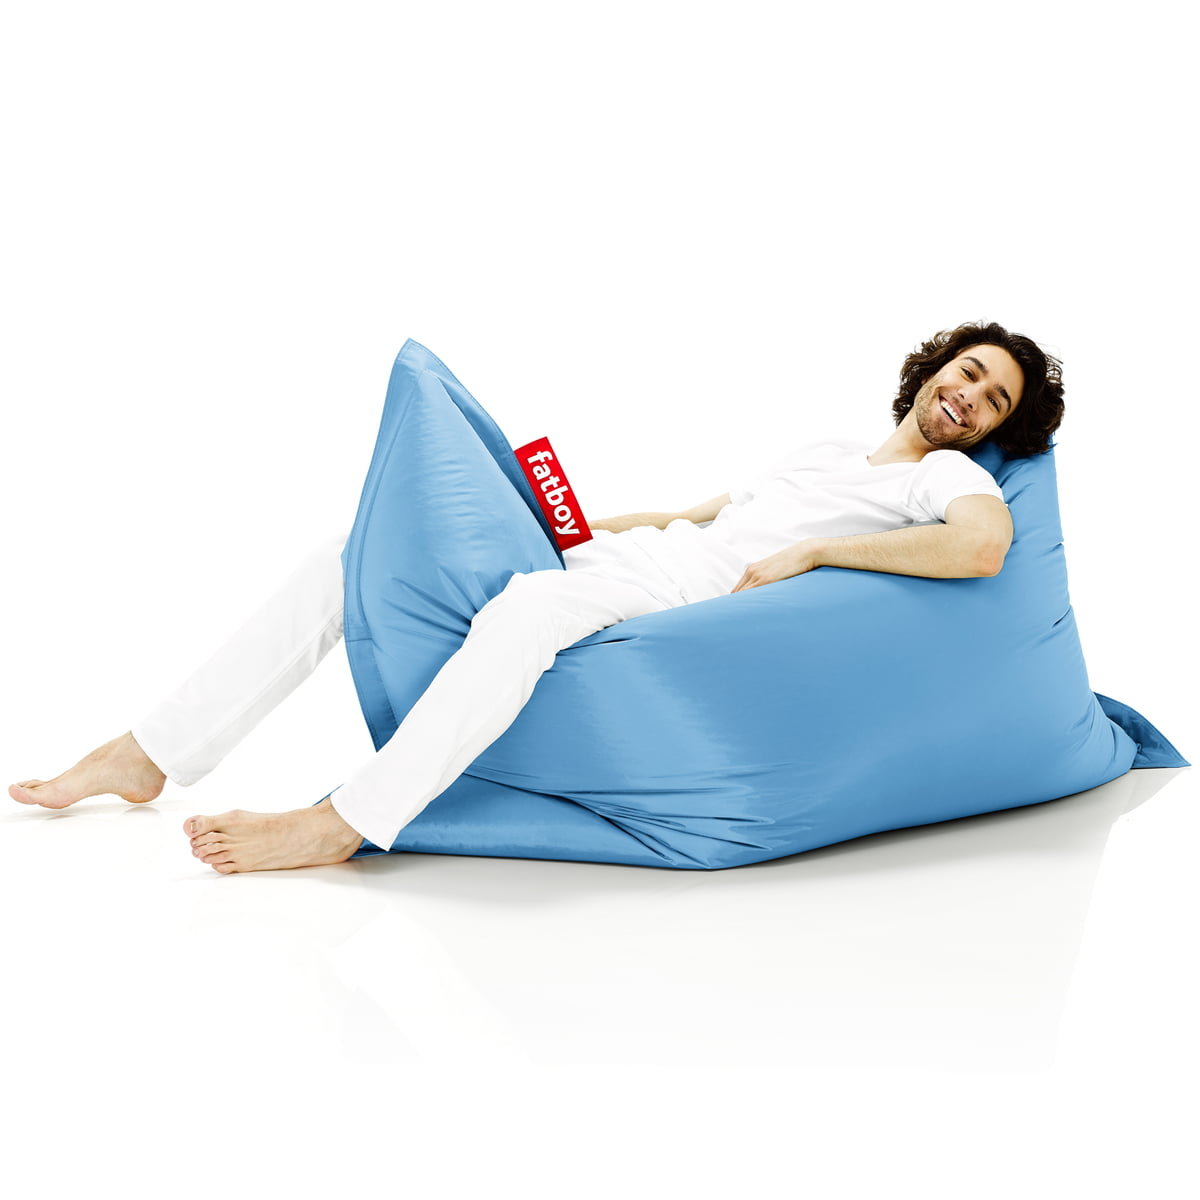 fatboy sitzsack original online kaufen shop. Black Bedroom Furniture Sets. Home Design Ideas